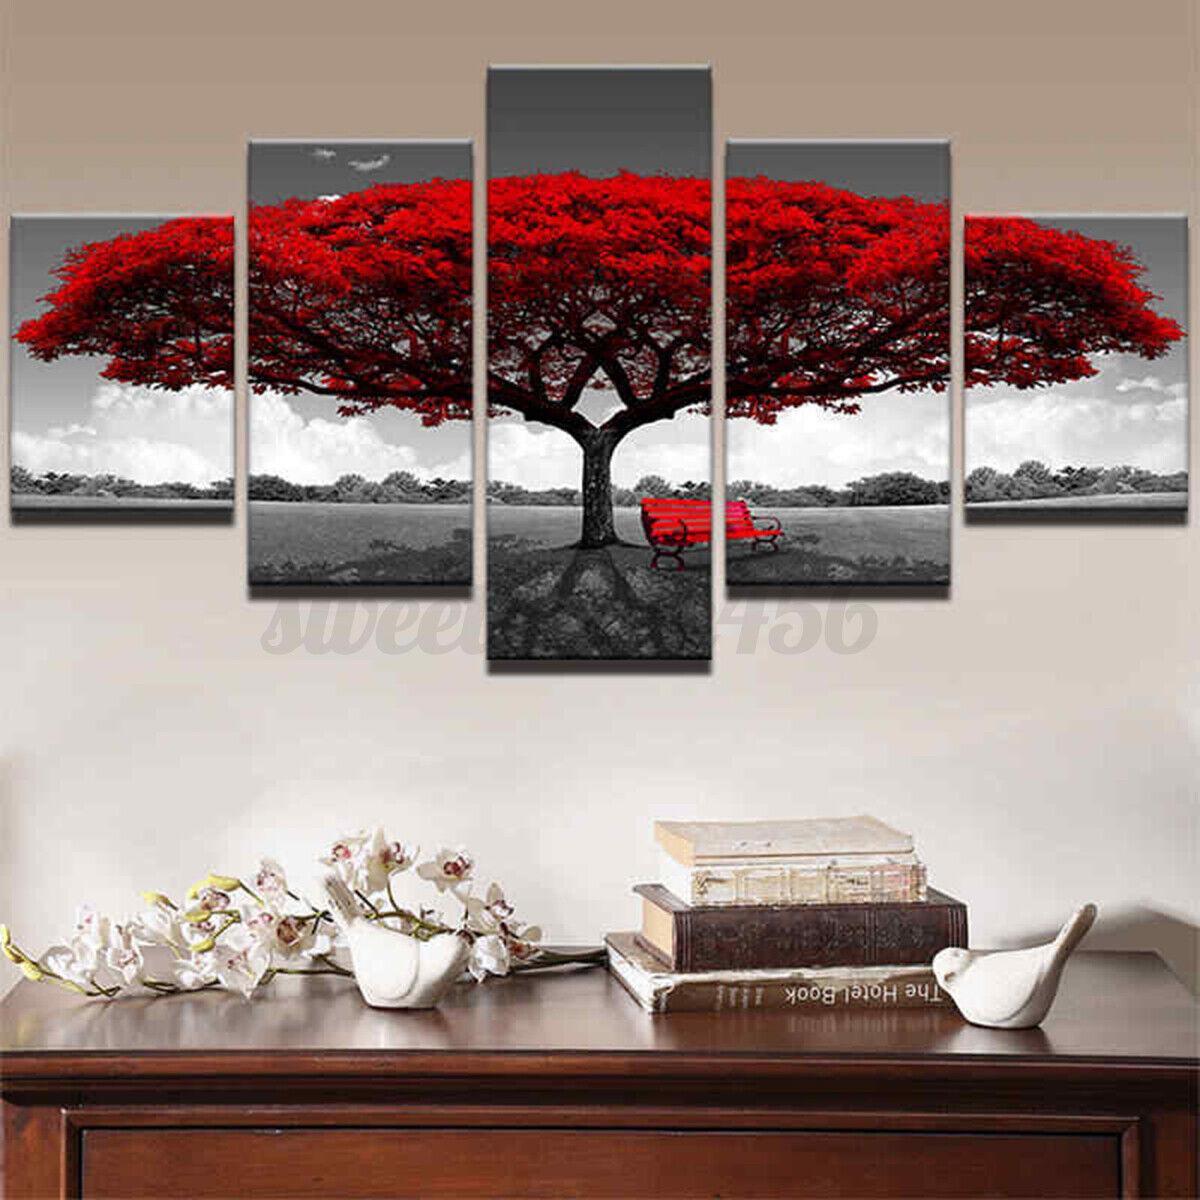 Yh Arts Pavement Cafe Design 1 Ceramic Wall Art Picture Plaque Tile 40x15cm Gift For Sale Online Ebay